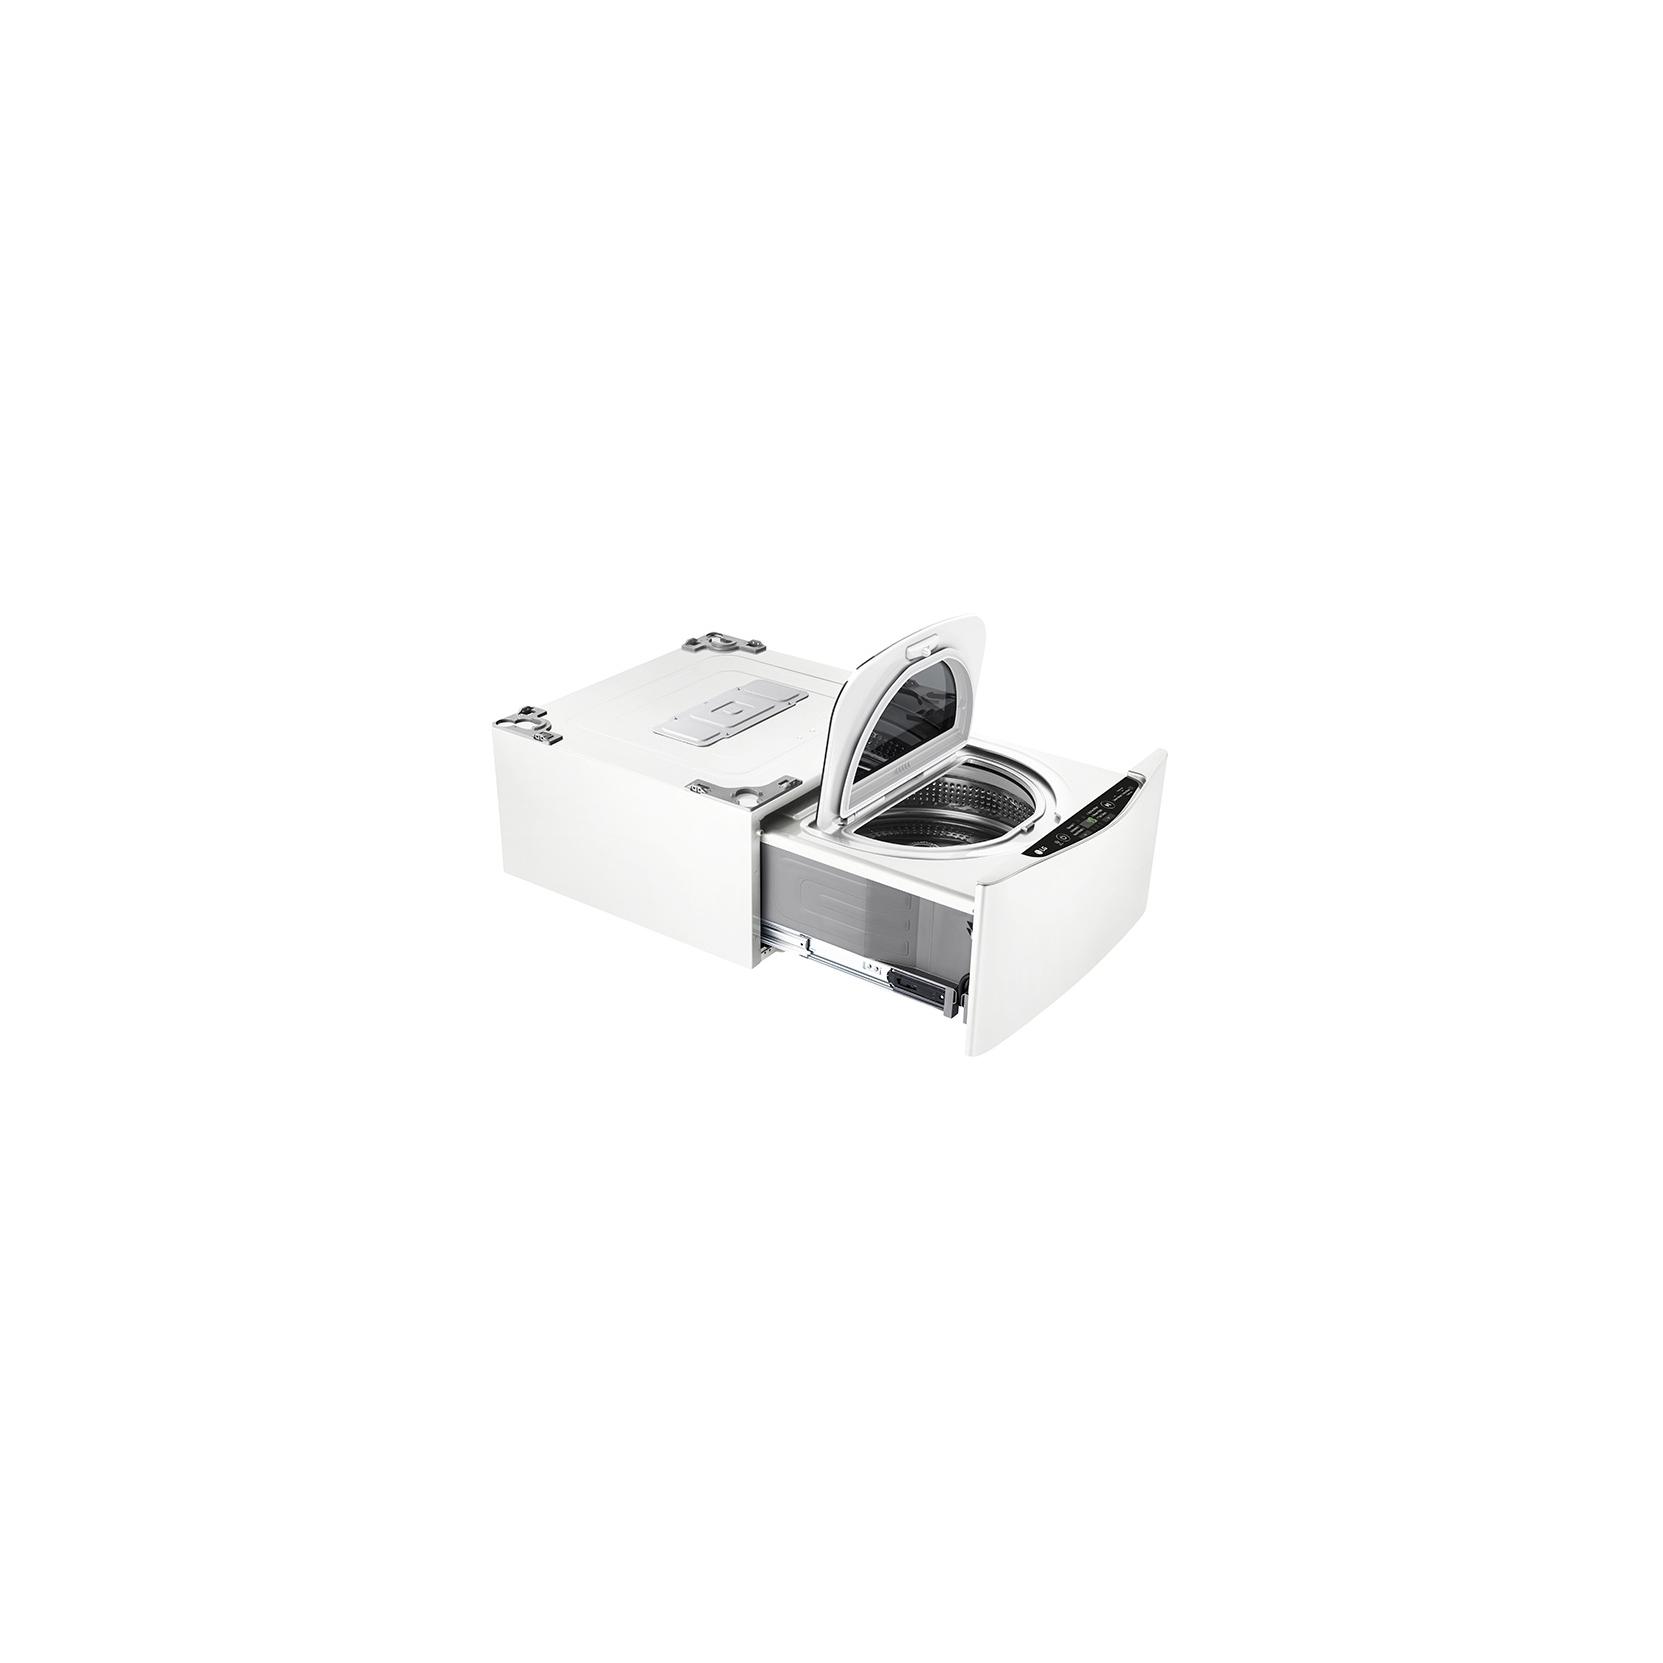 Lavatrice lg f70e1udn0 mini twinwash 3 5kg 700 giri for Mini lavatrice